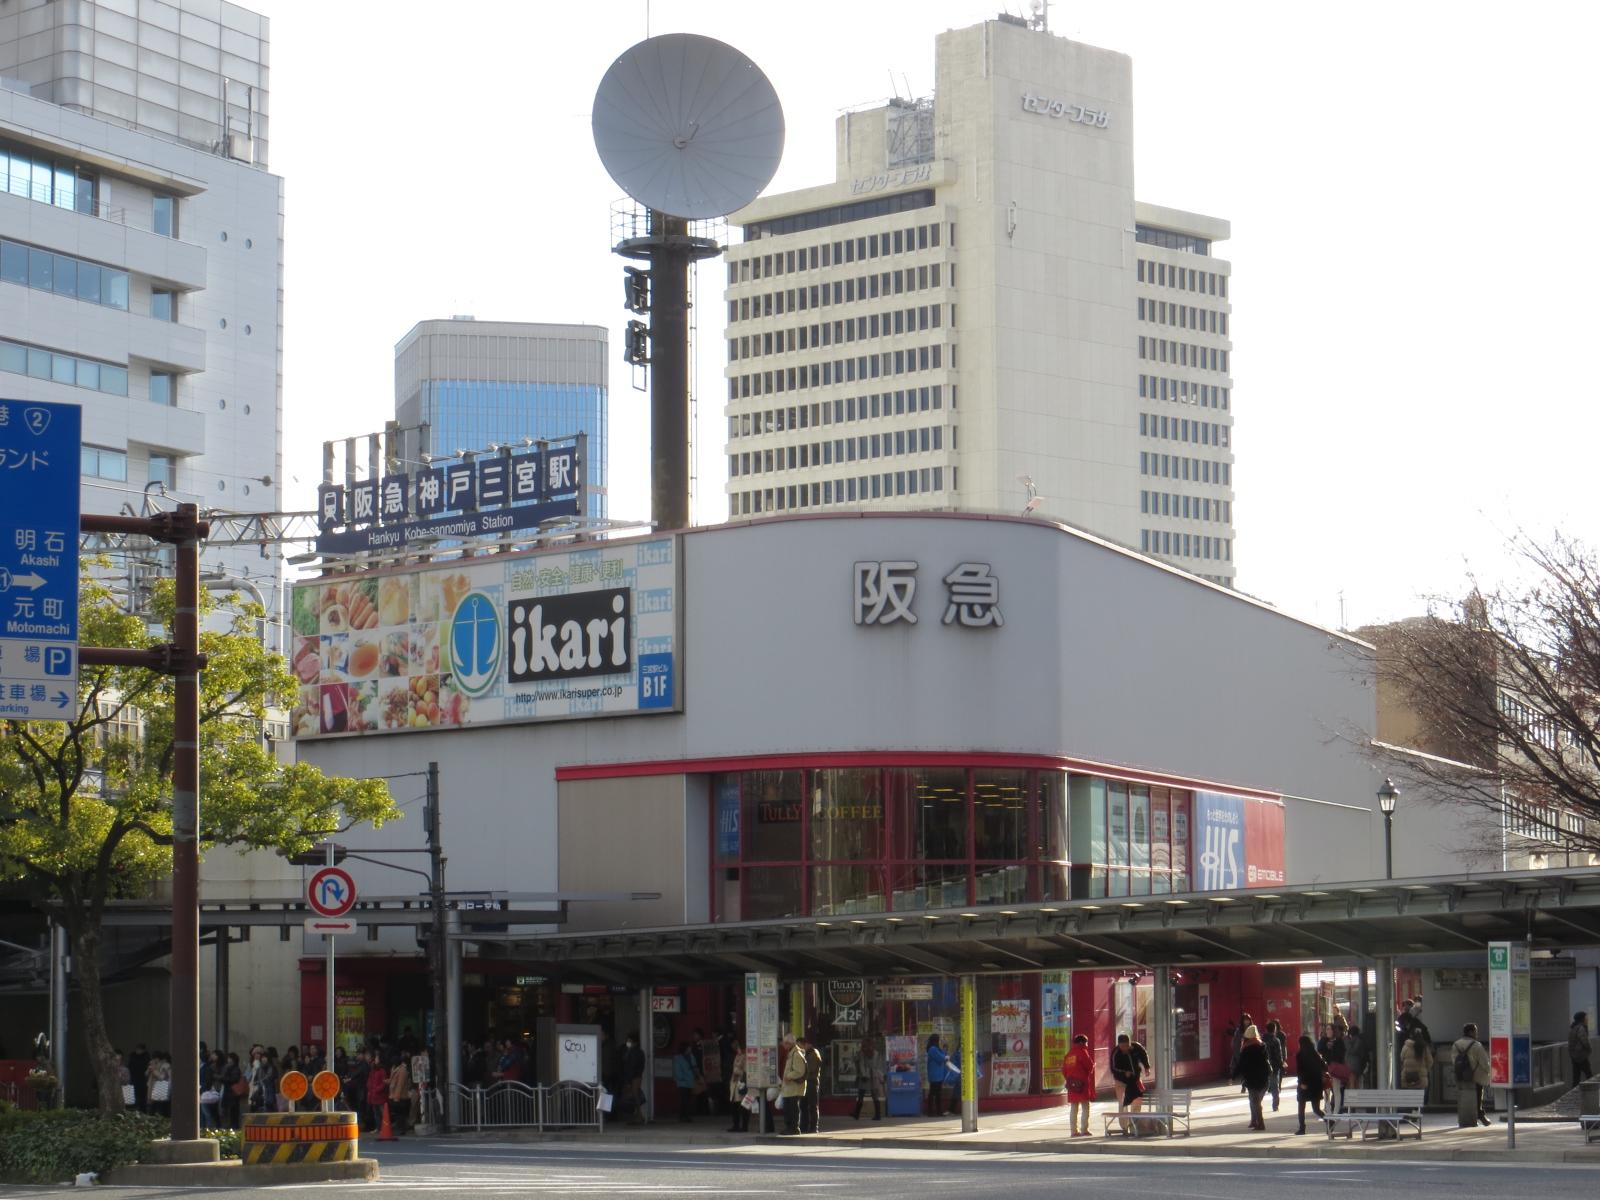 File:Kobe-sannomiya Station Hankyu (02) IMG 3171 20140105